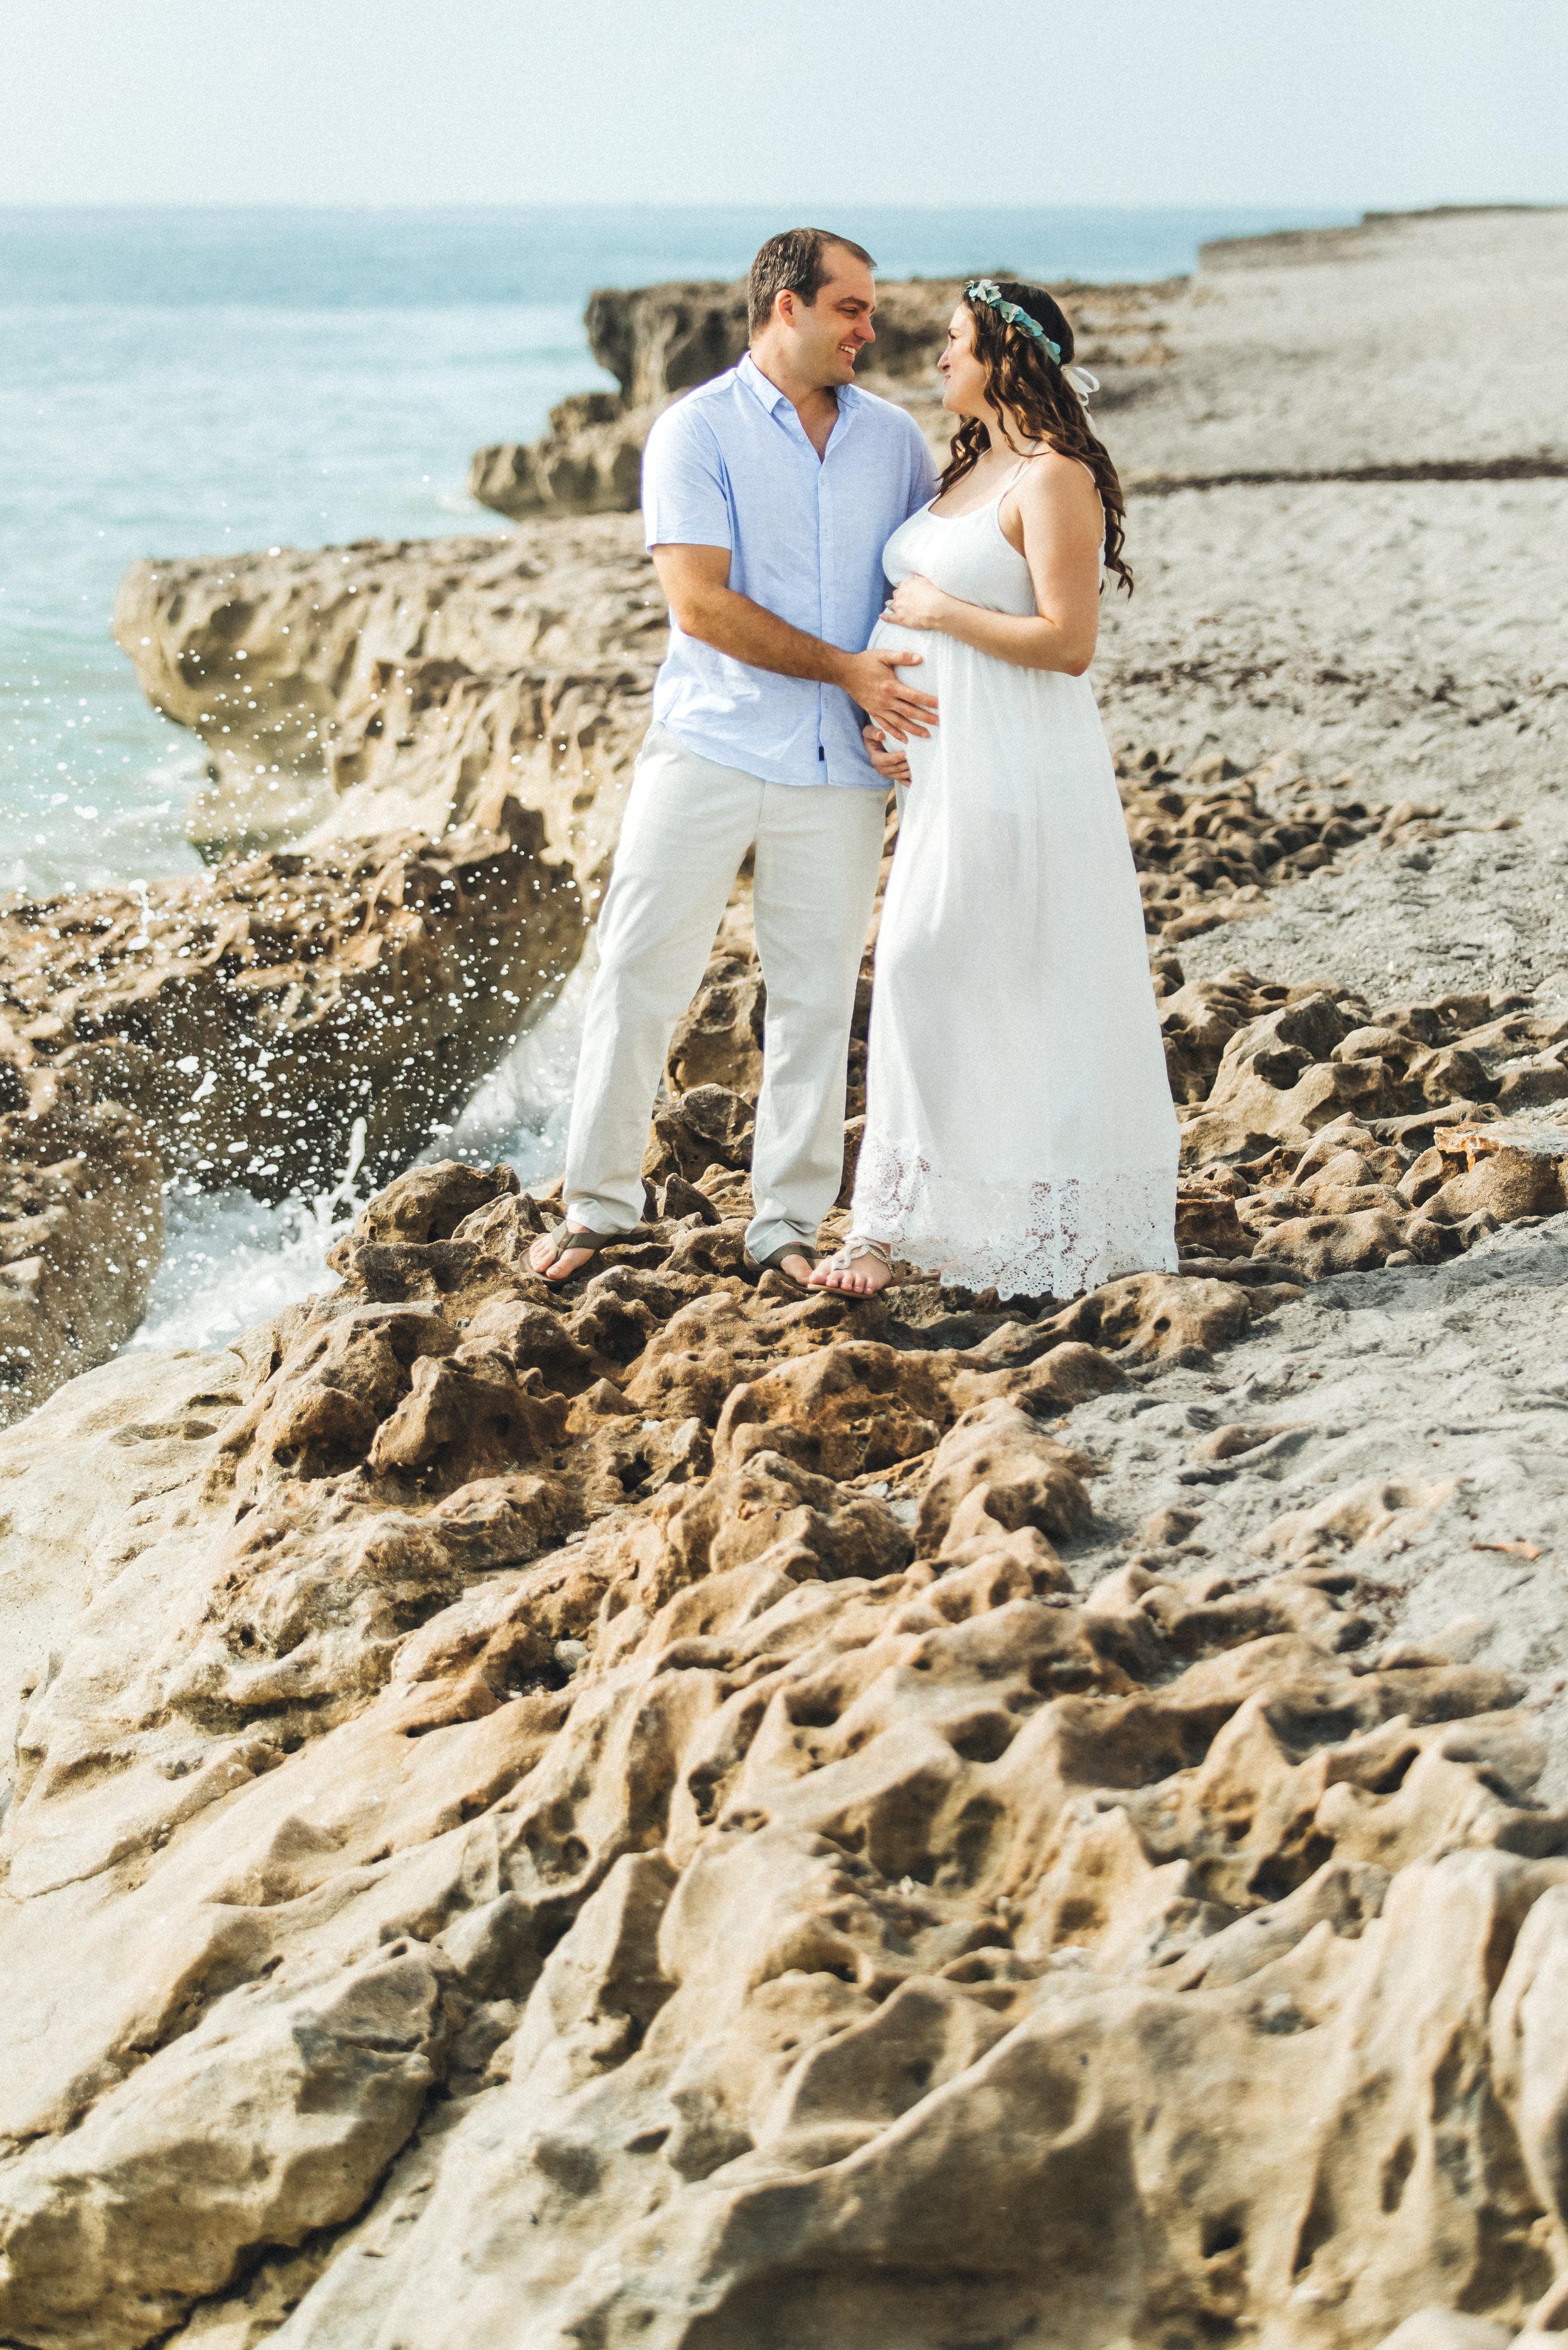 White Maternity Dress- Erica + Aaron's Blowing Rock Preserve- Florida Maternity Photos-14.jpg